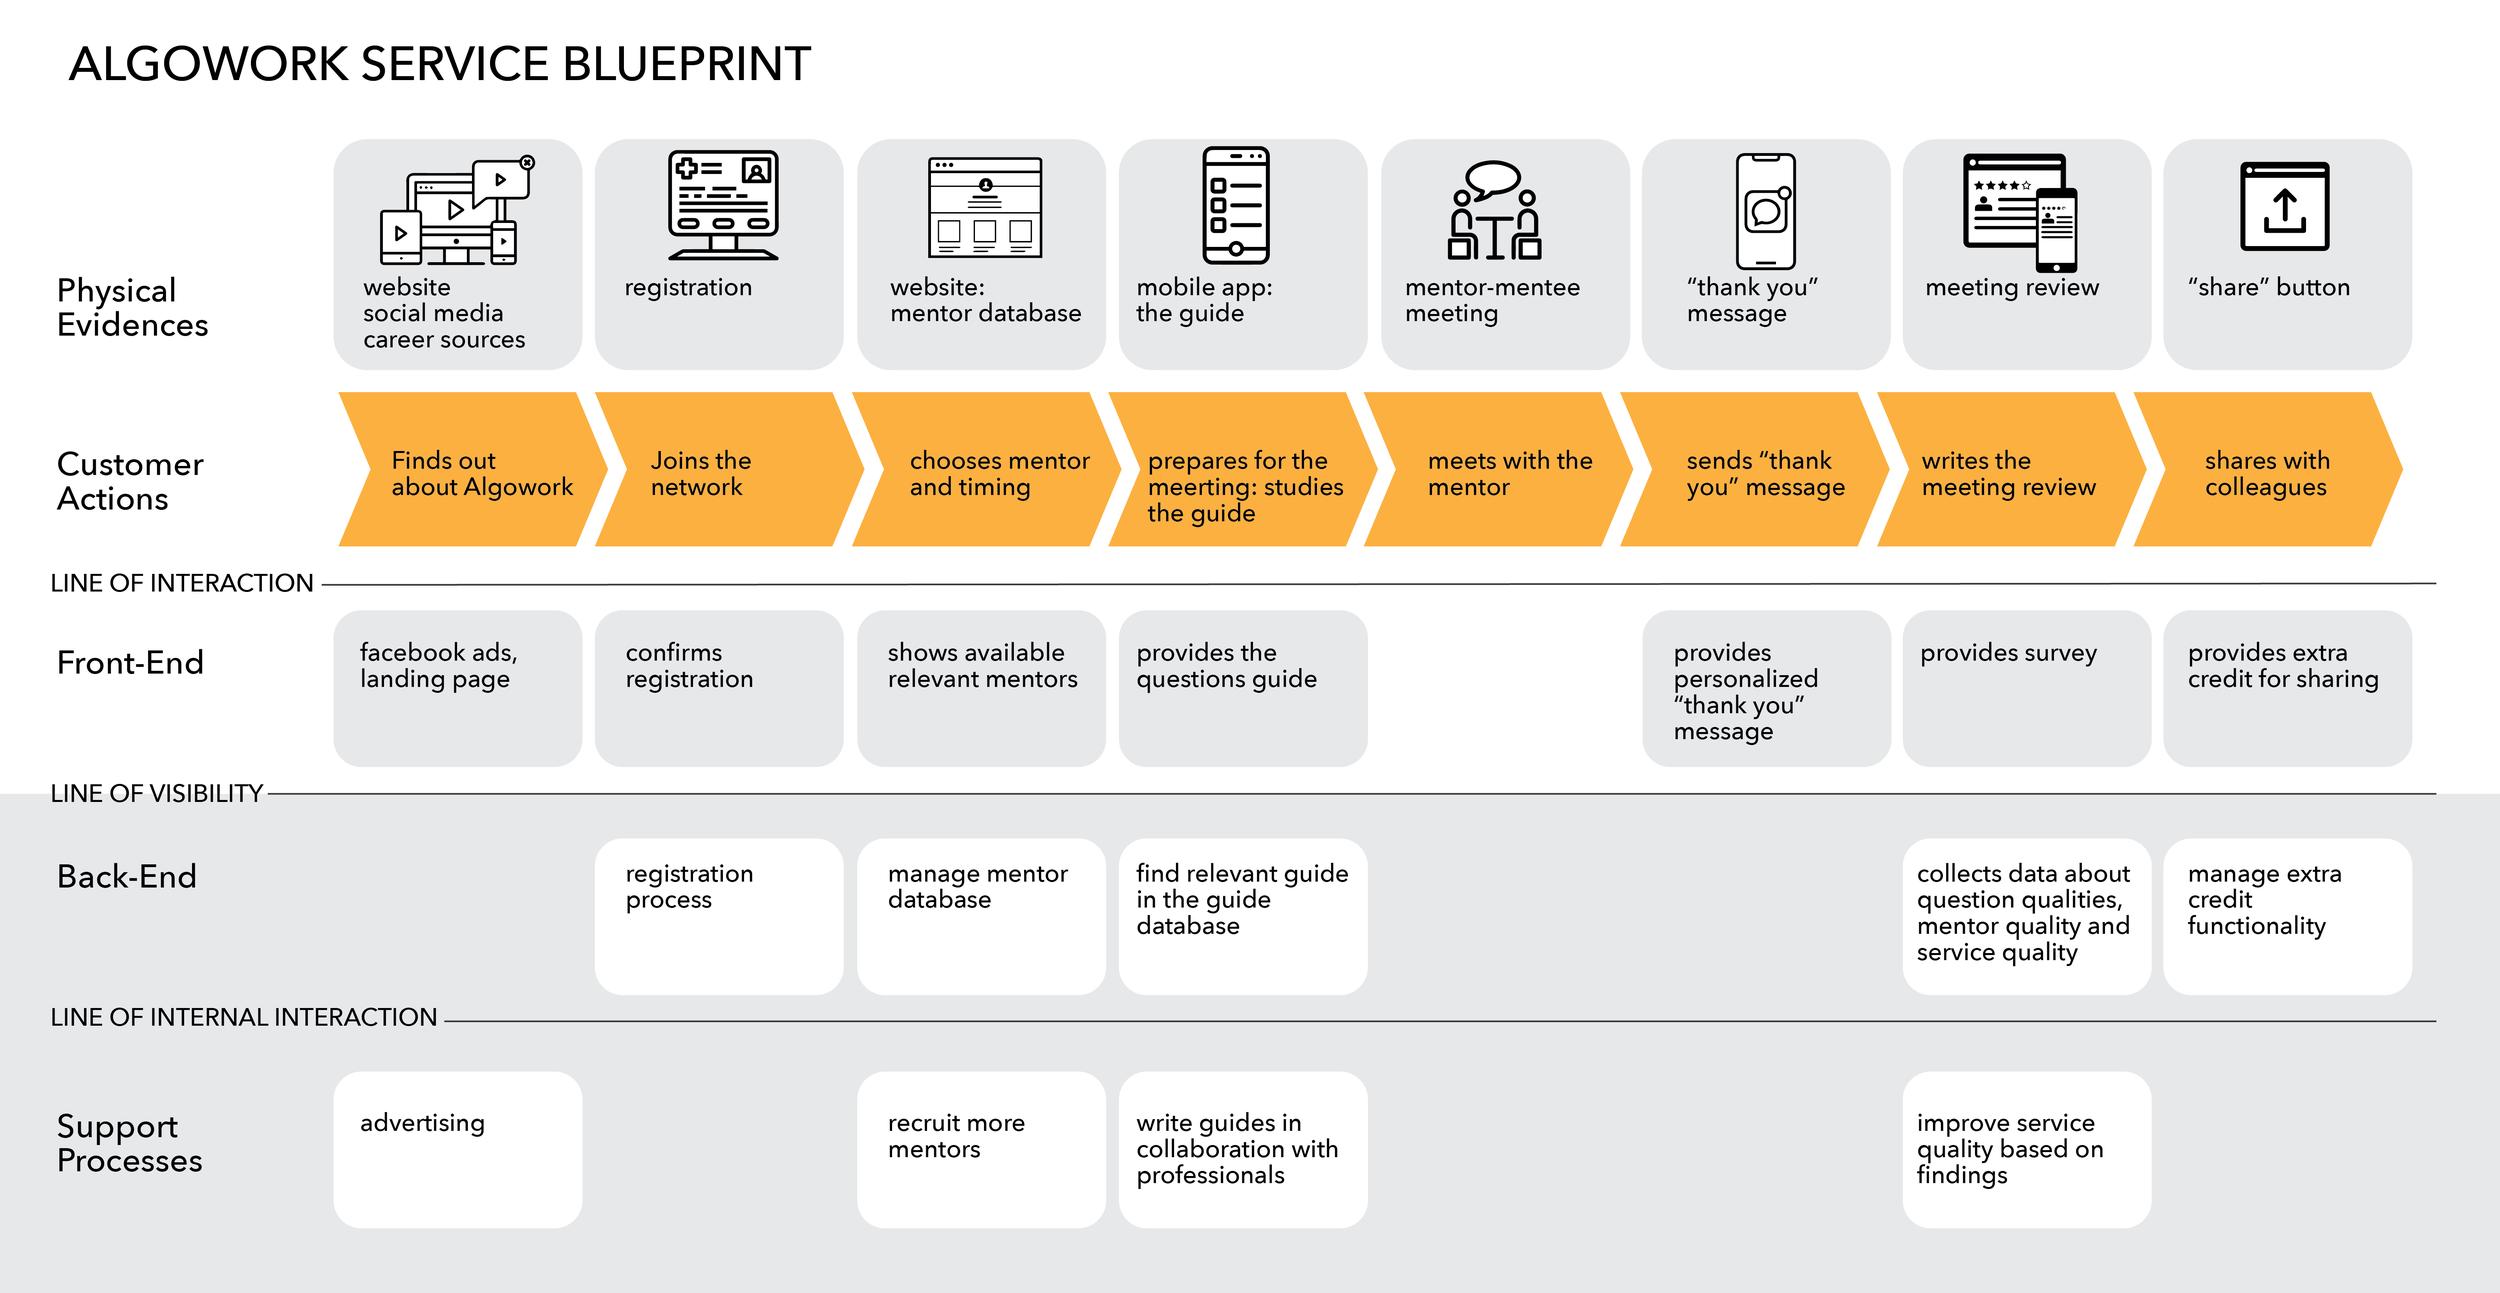 algowork blueprint-05.png